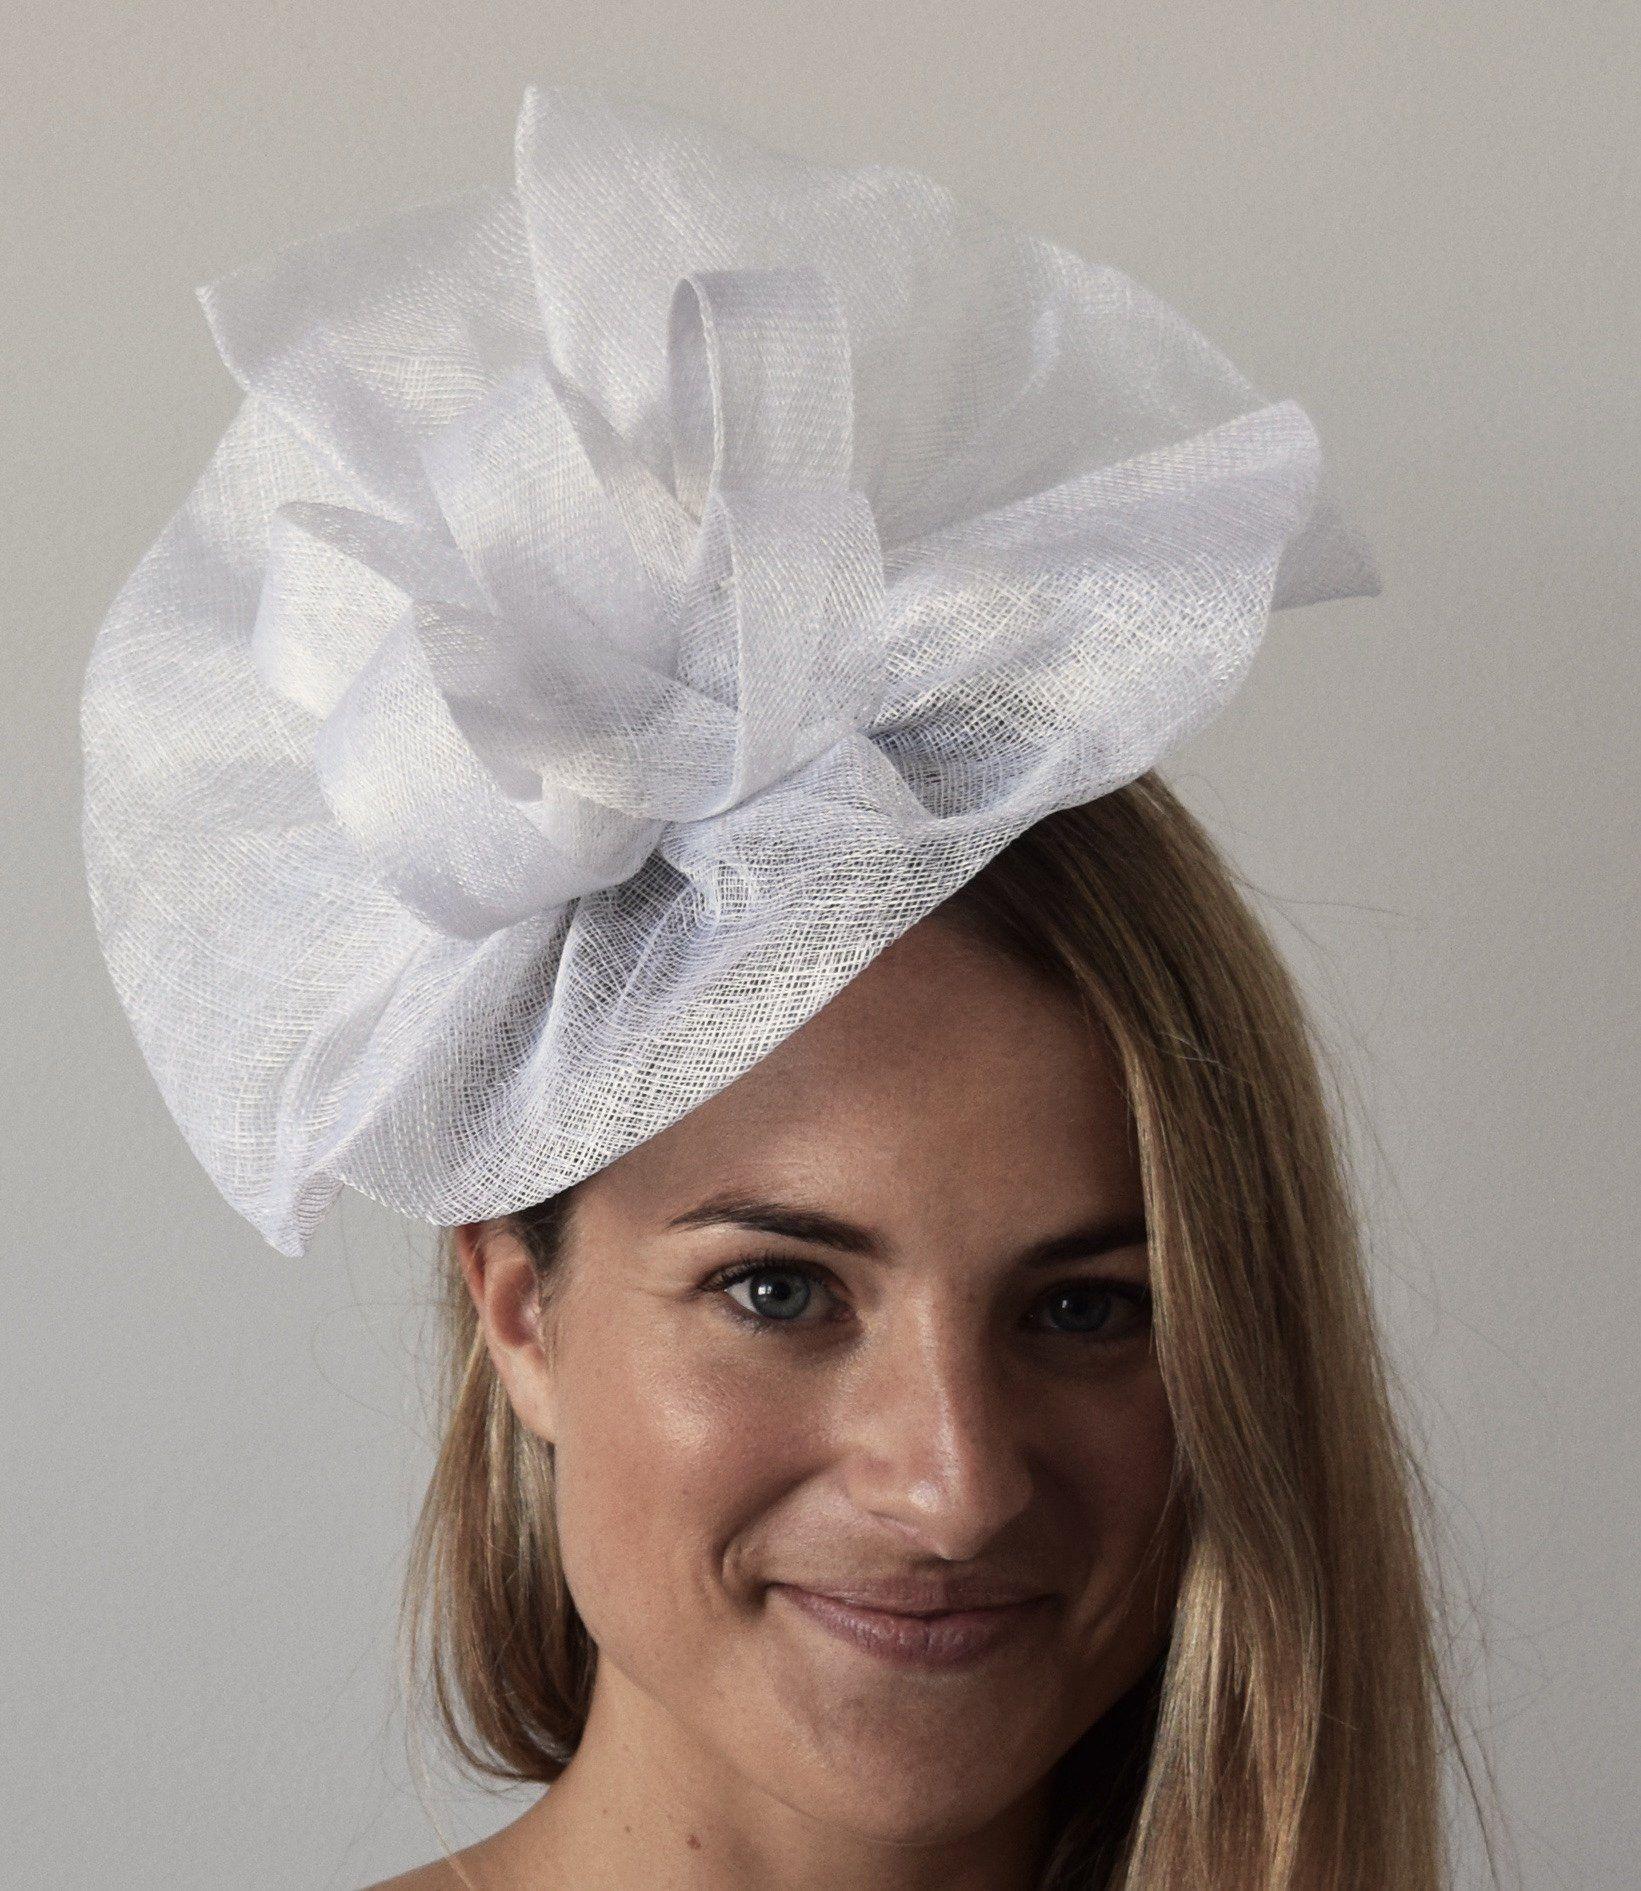 4eef9366d464c Tia large bright red fascinator royal wedding hat kentucky derby hat ...